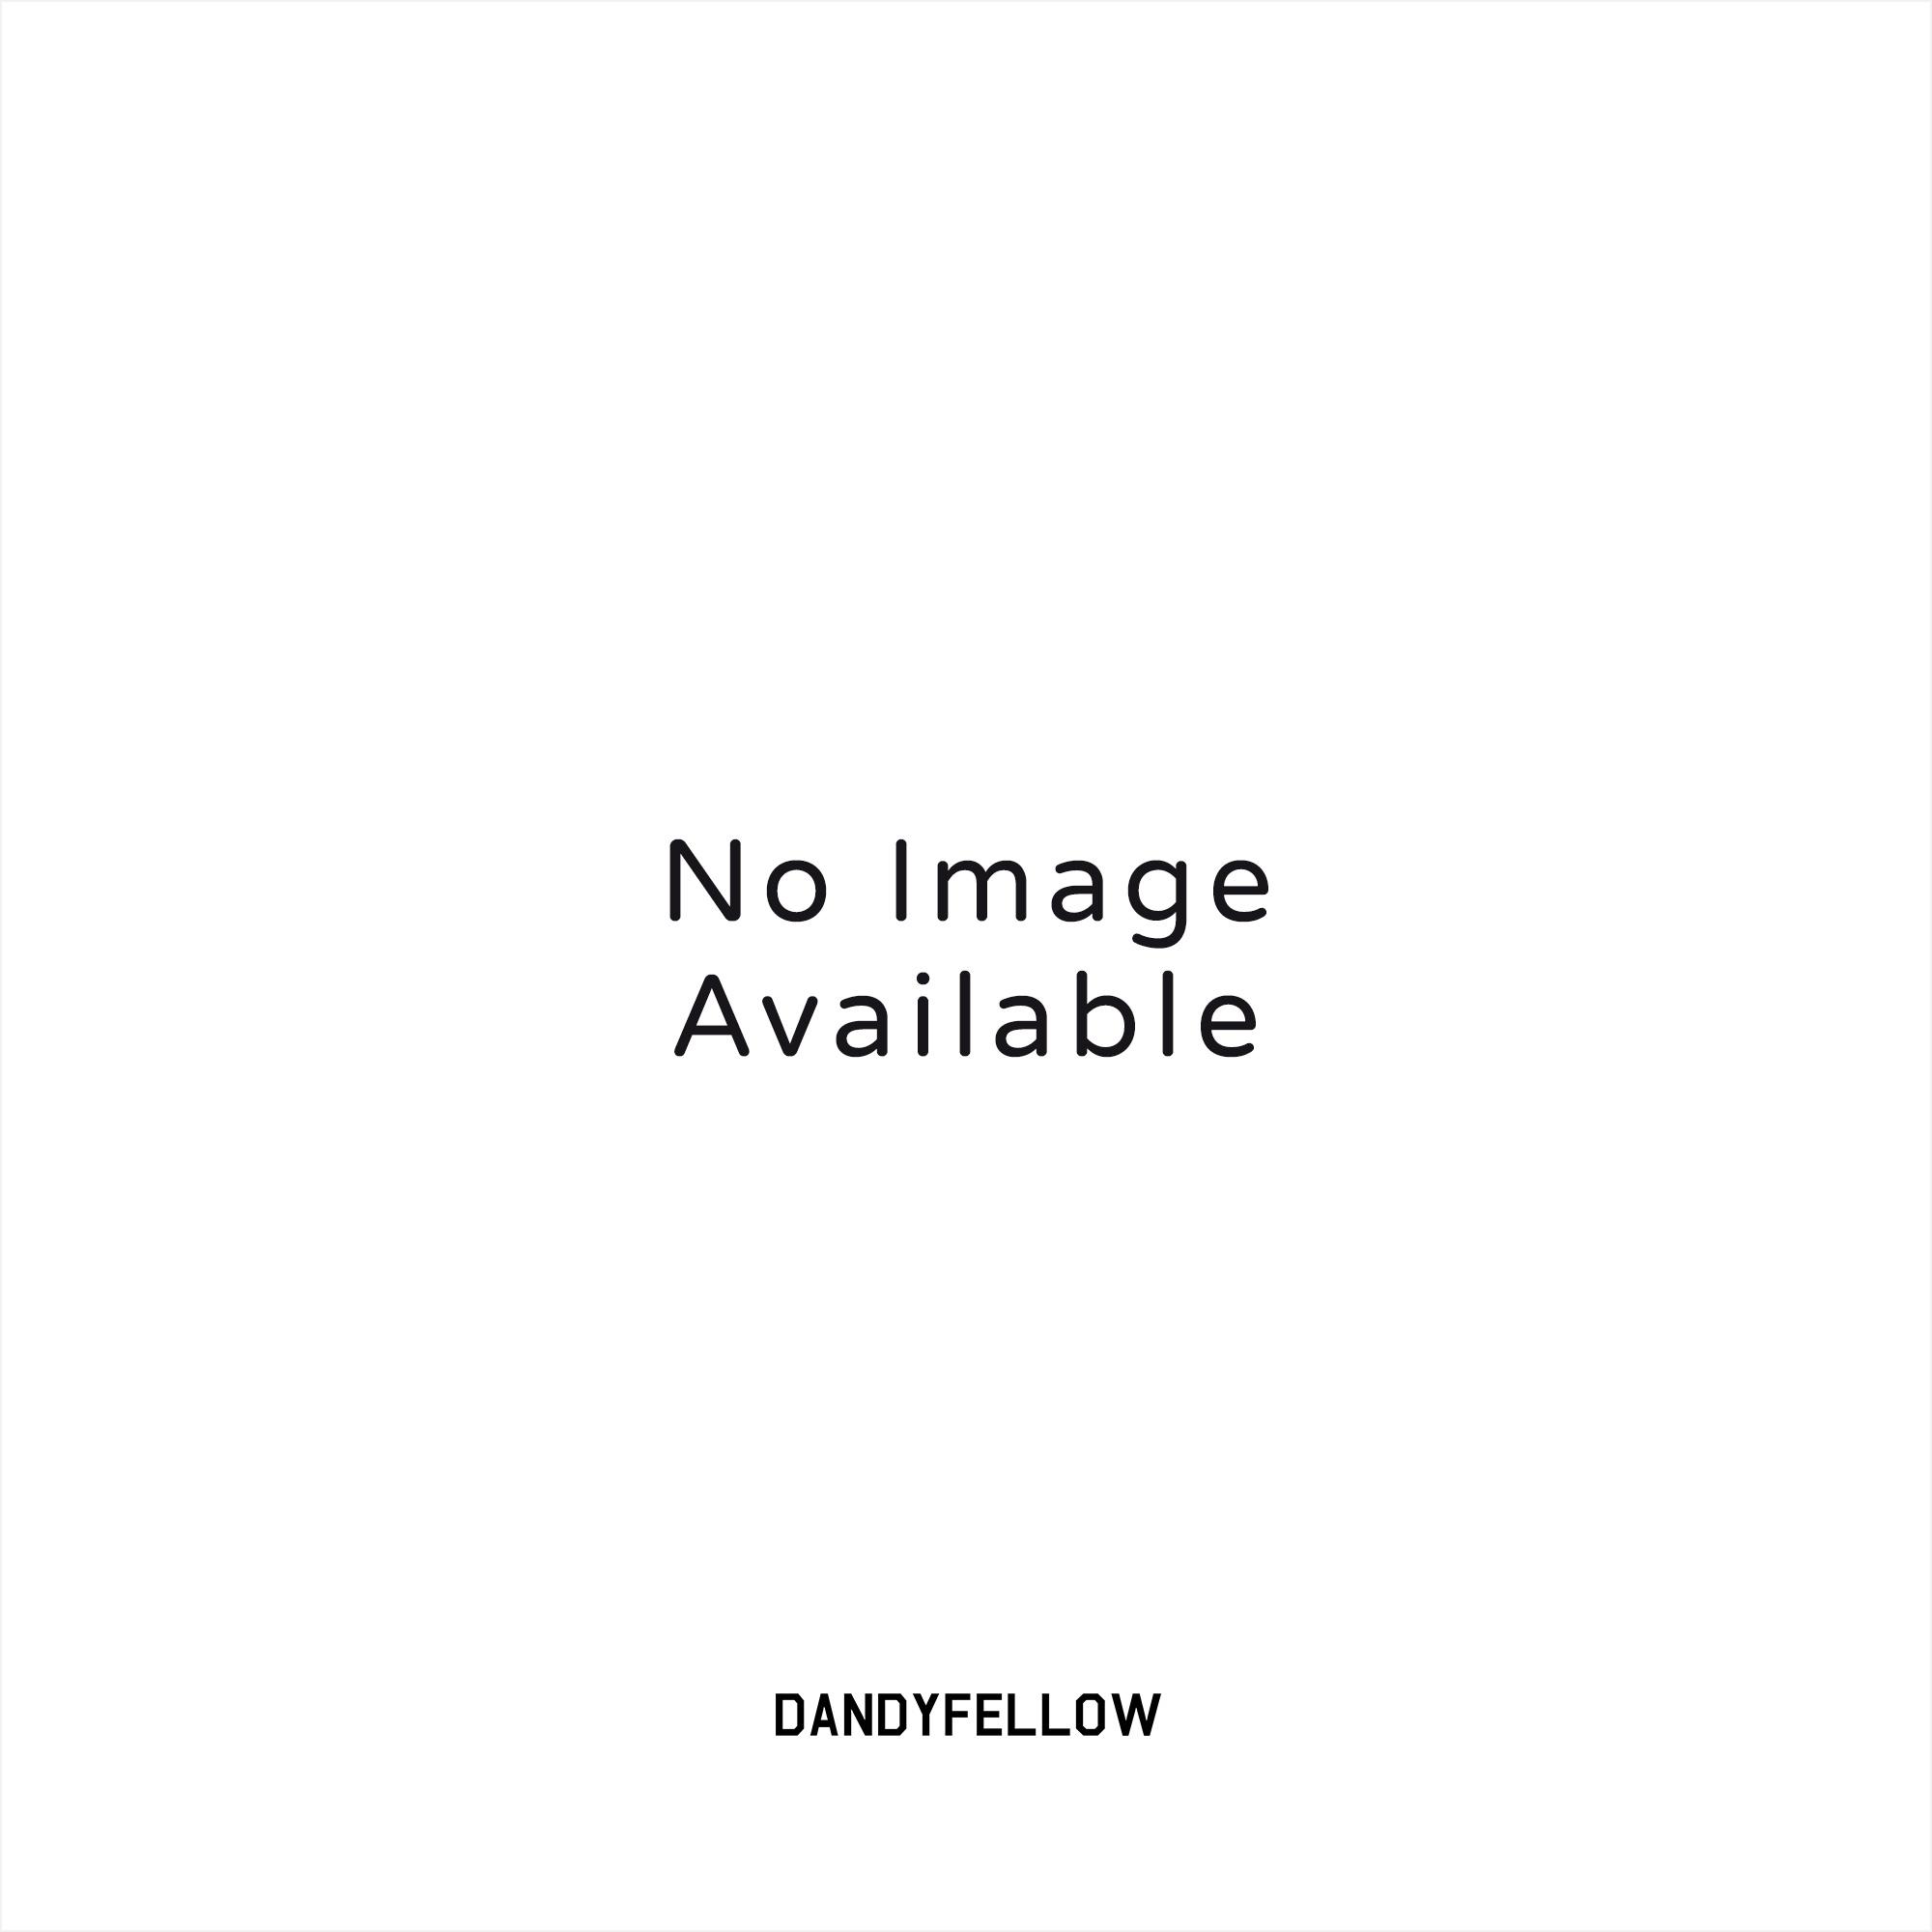 708b964d4b94 Lacoste Bord Cotes Striped Polo Shirt PH2068 00FUJ